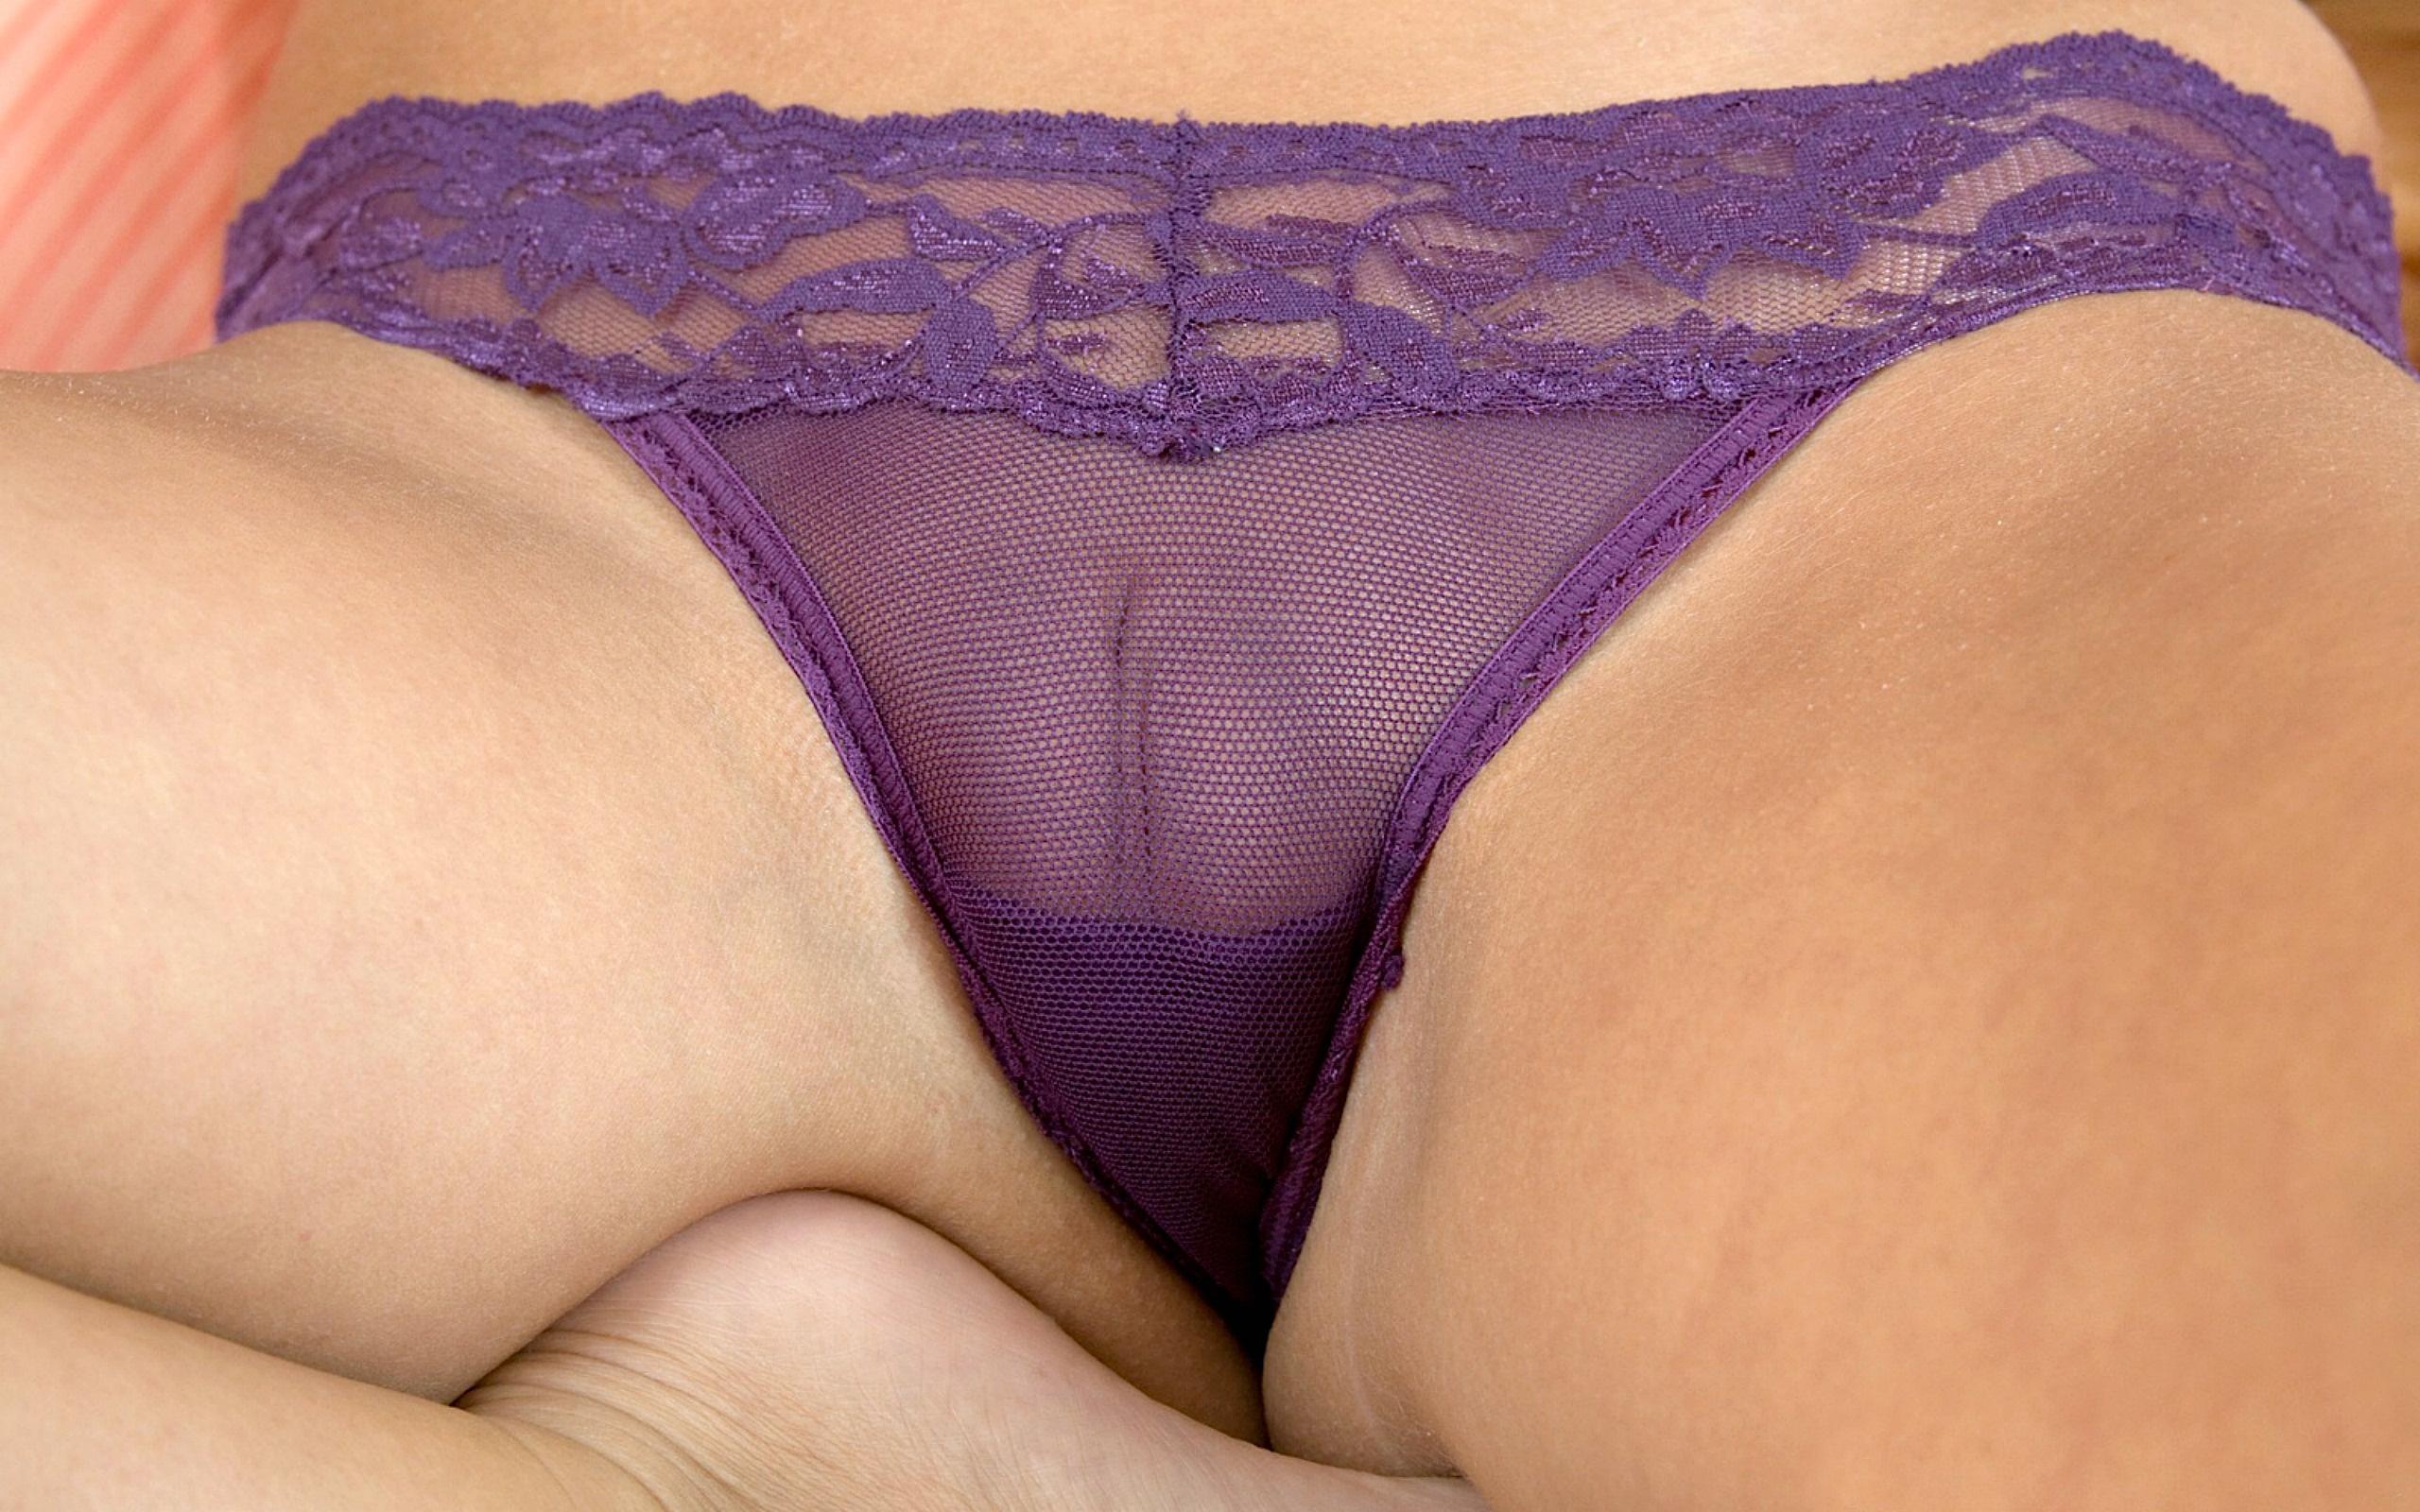 download photo 1920x1080 destiny moody model panties